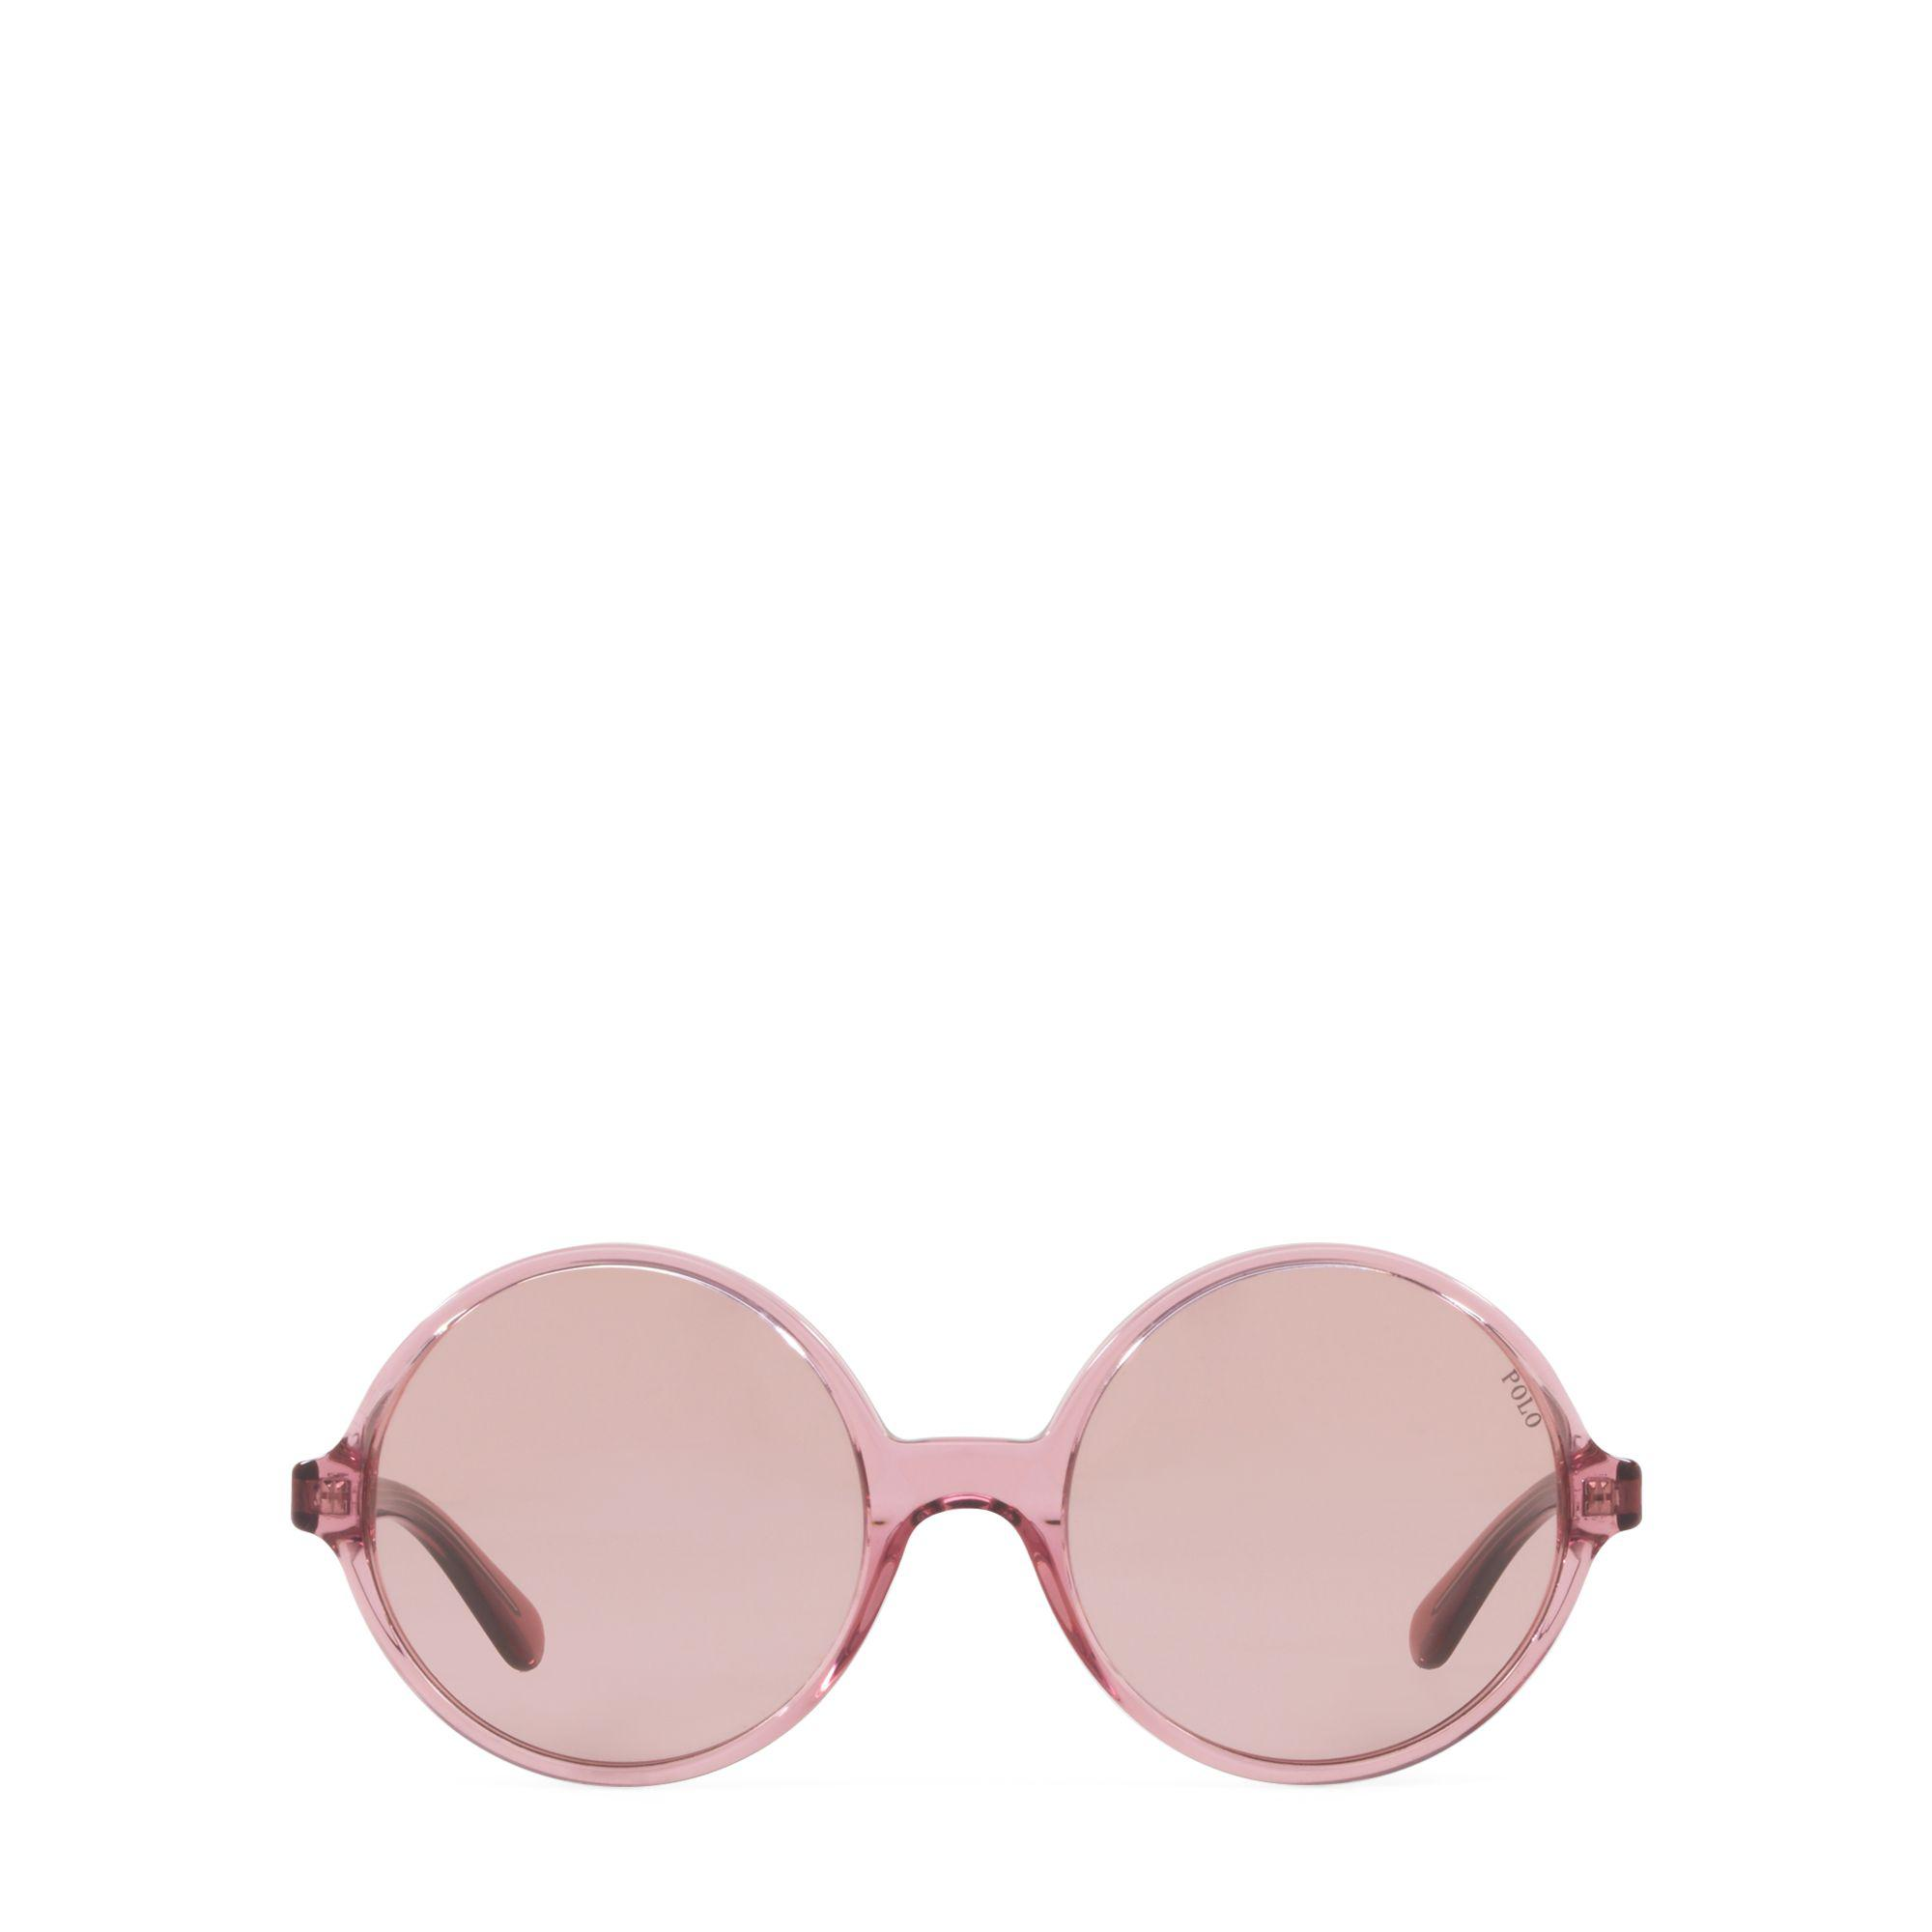 baf201d972b Lyst - Polo Ralph Lauren Oversize Round Sunglasses in Pink